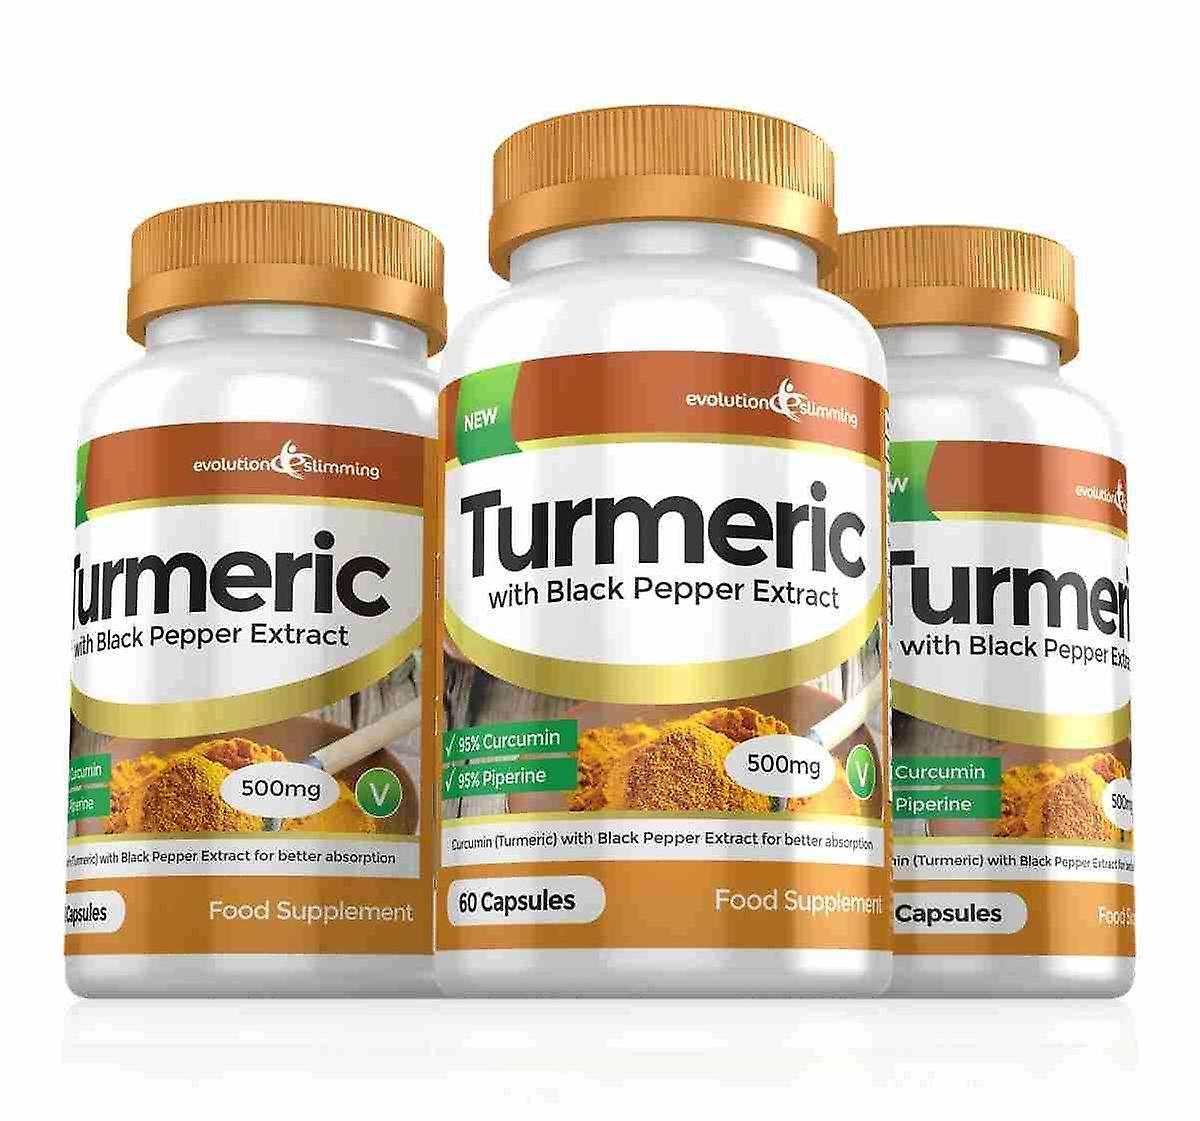 Turmeric 95% Curcumin and Black Pepper Extract 500mg - 180 Capsules - Fat Burner - Evolution Slimming